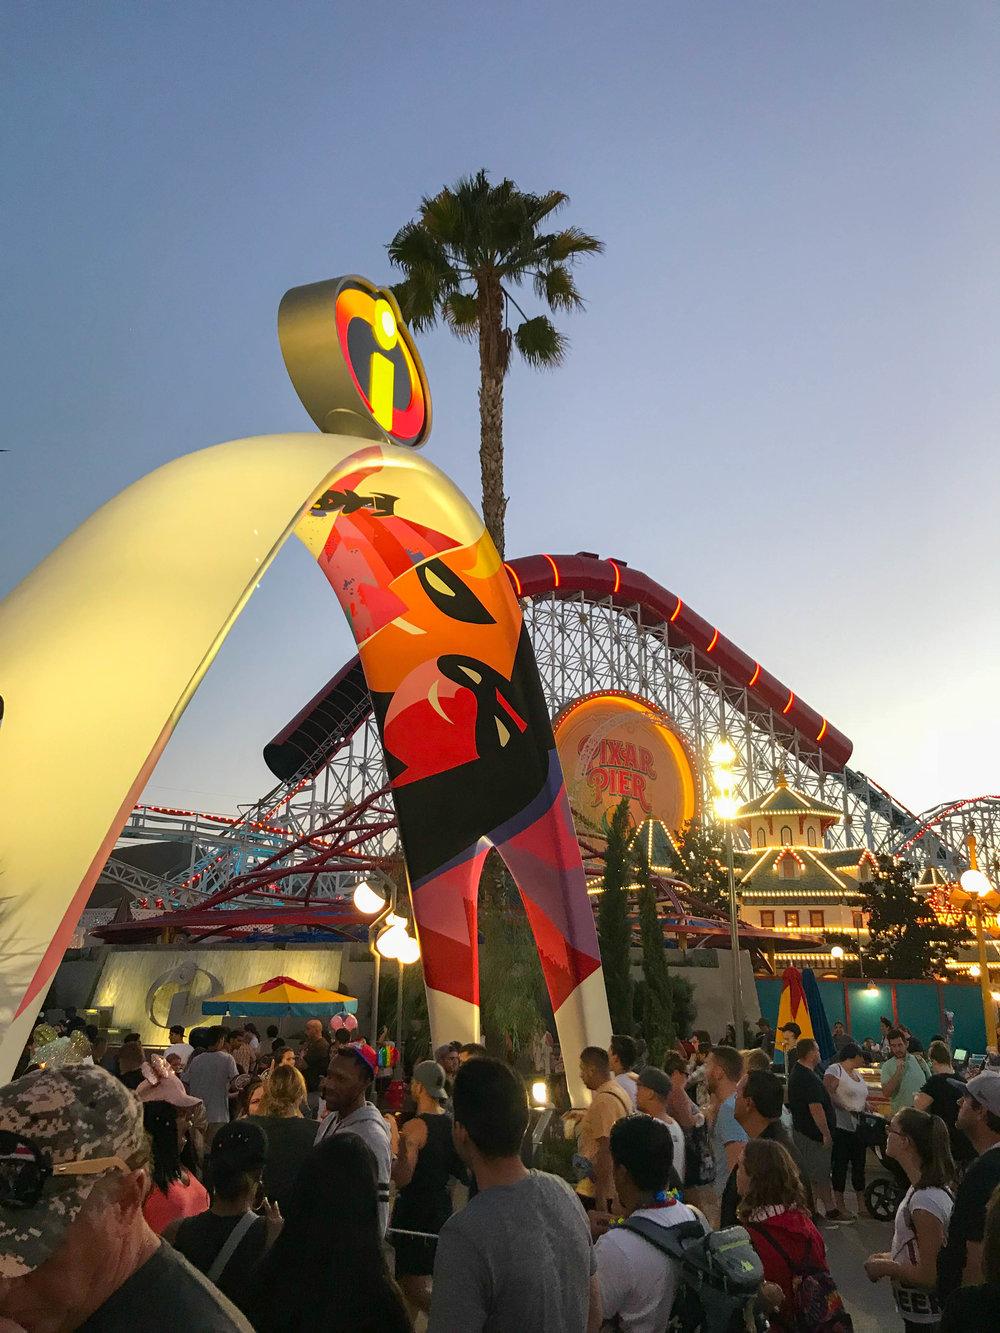 Disneyland_Pixar_Fest - Pixar Pier - Incredicoaster